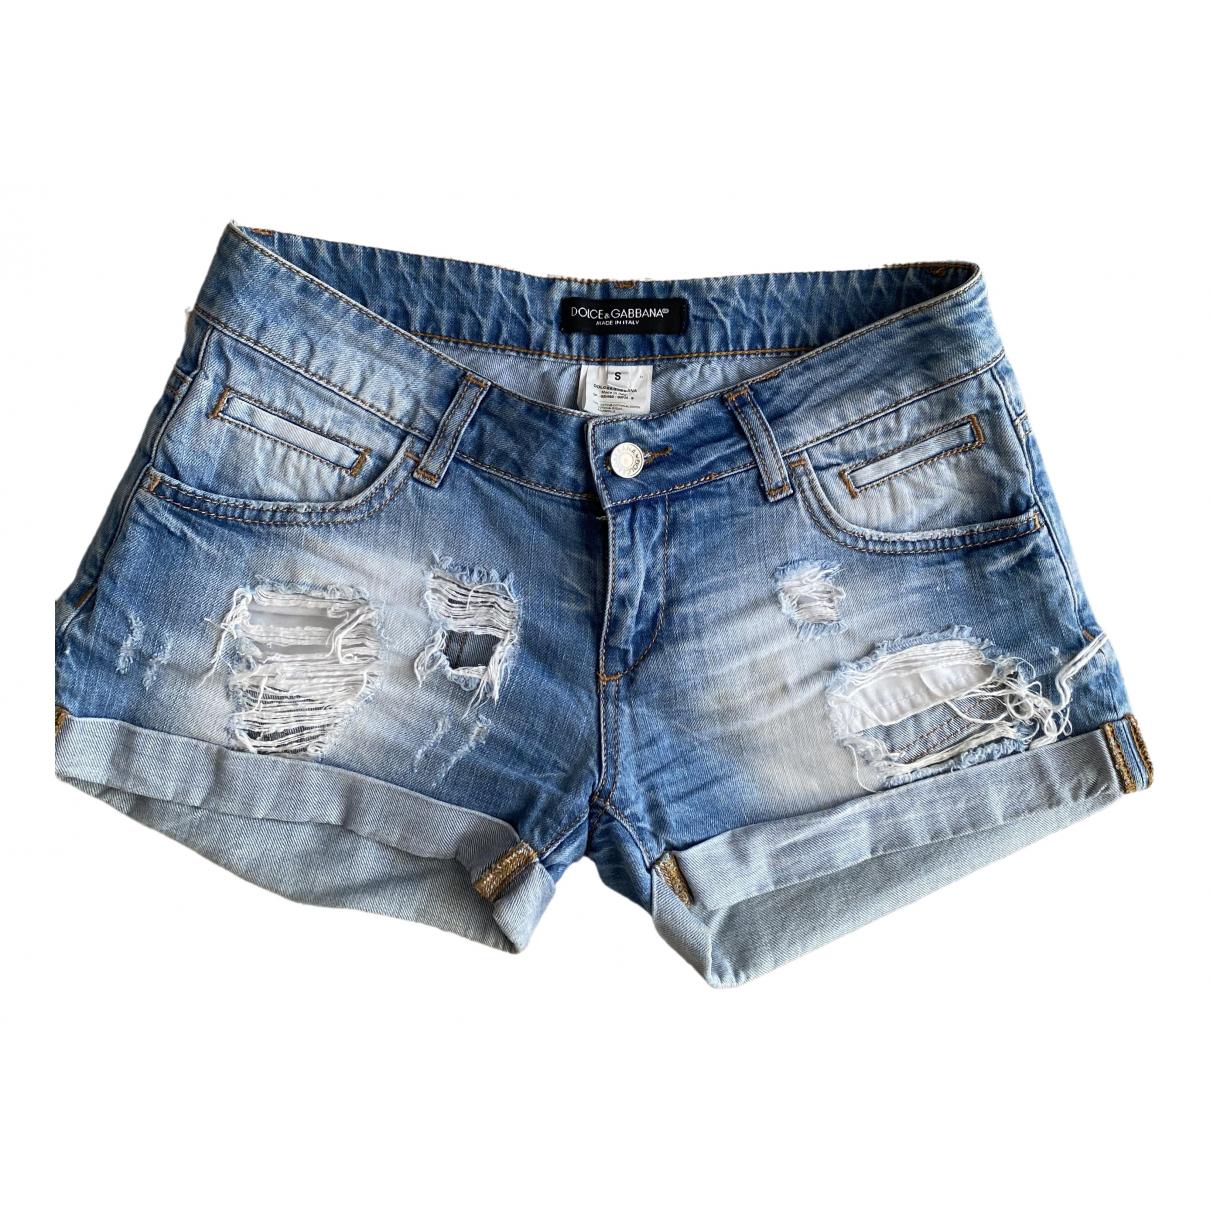 Dolce & Gabbana \N Shorts in  Blau Denim - Jeans